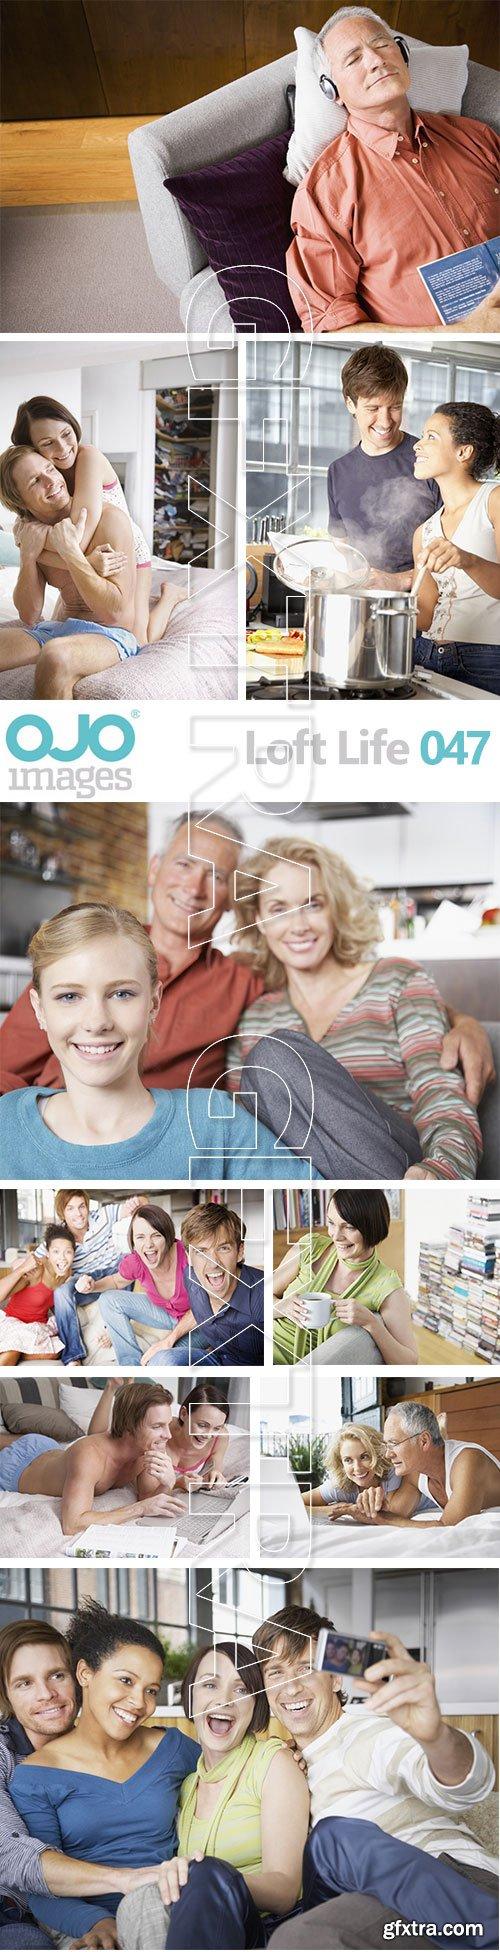 OJO Images OJ047 Loft Life